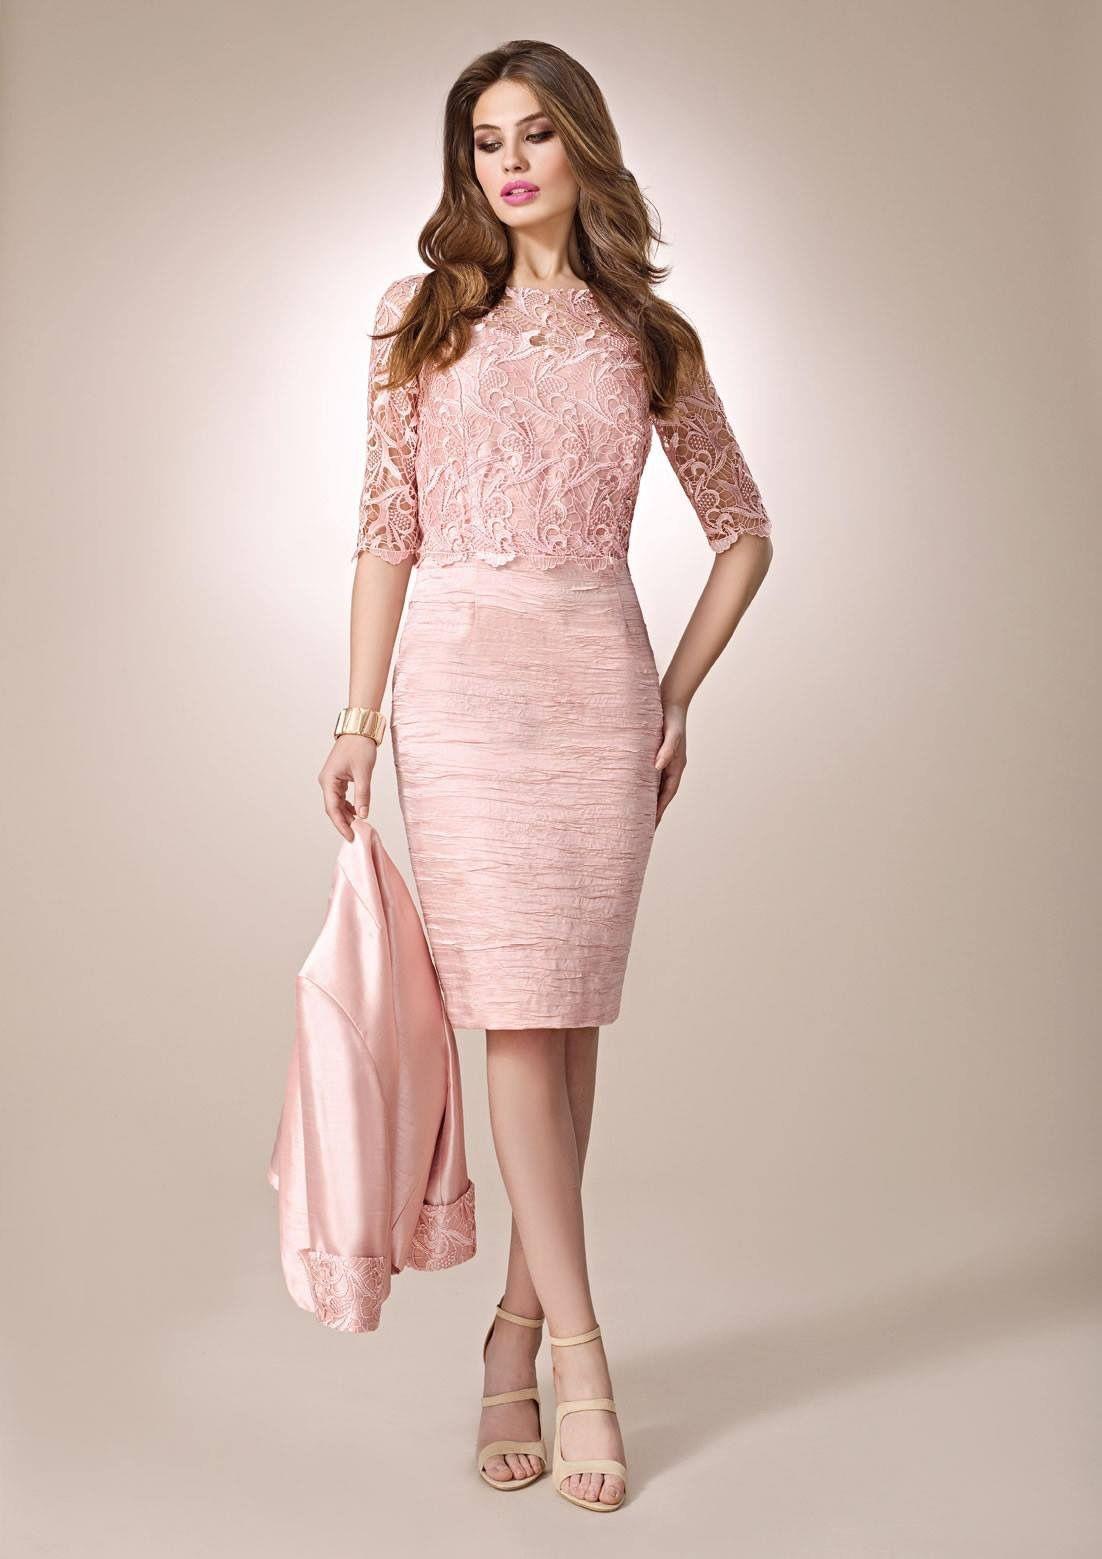 Pin de Margie Helena Donner en vestidos curtos | Pinterest ...